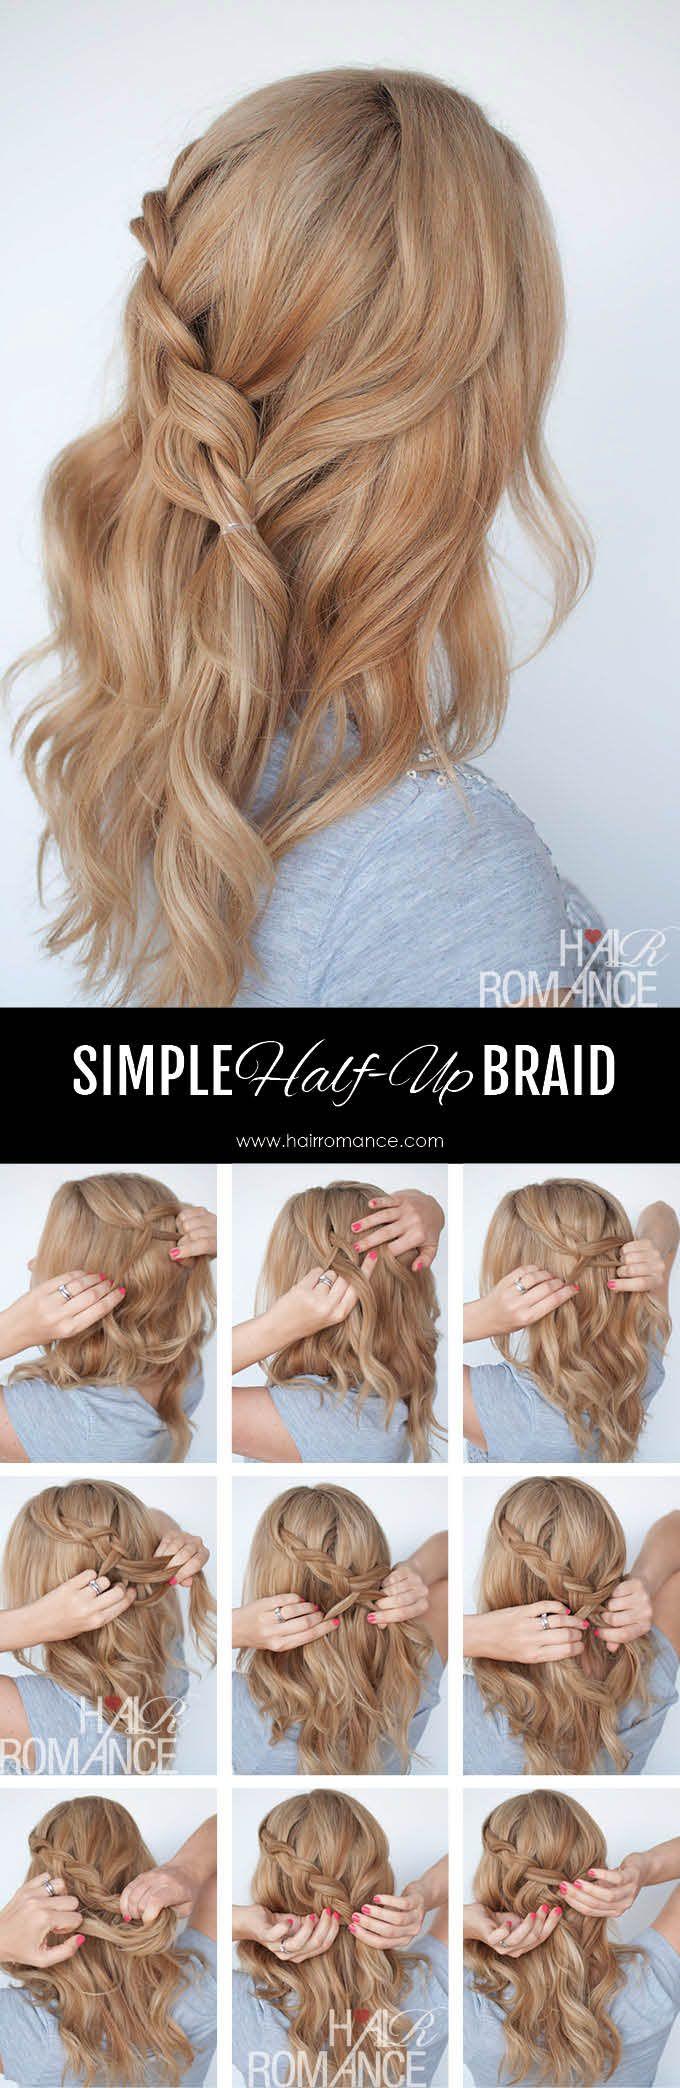 Hair romance simple halfup braid tutorial hair pinterest